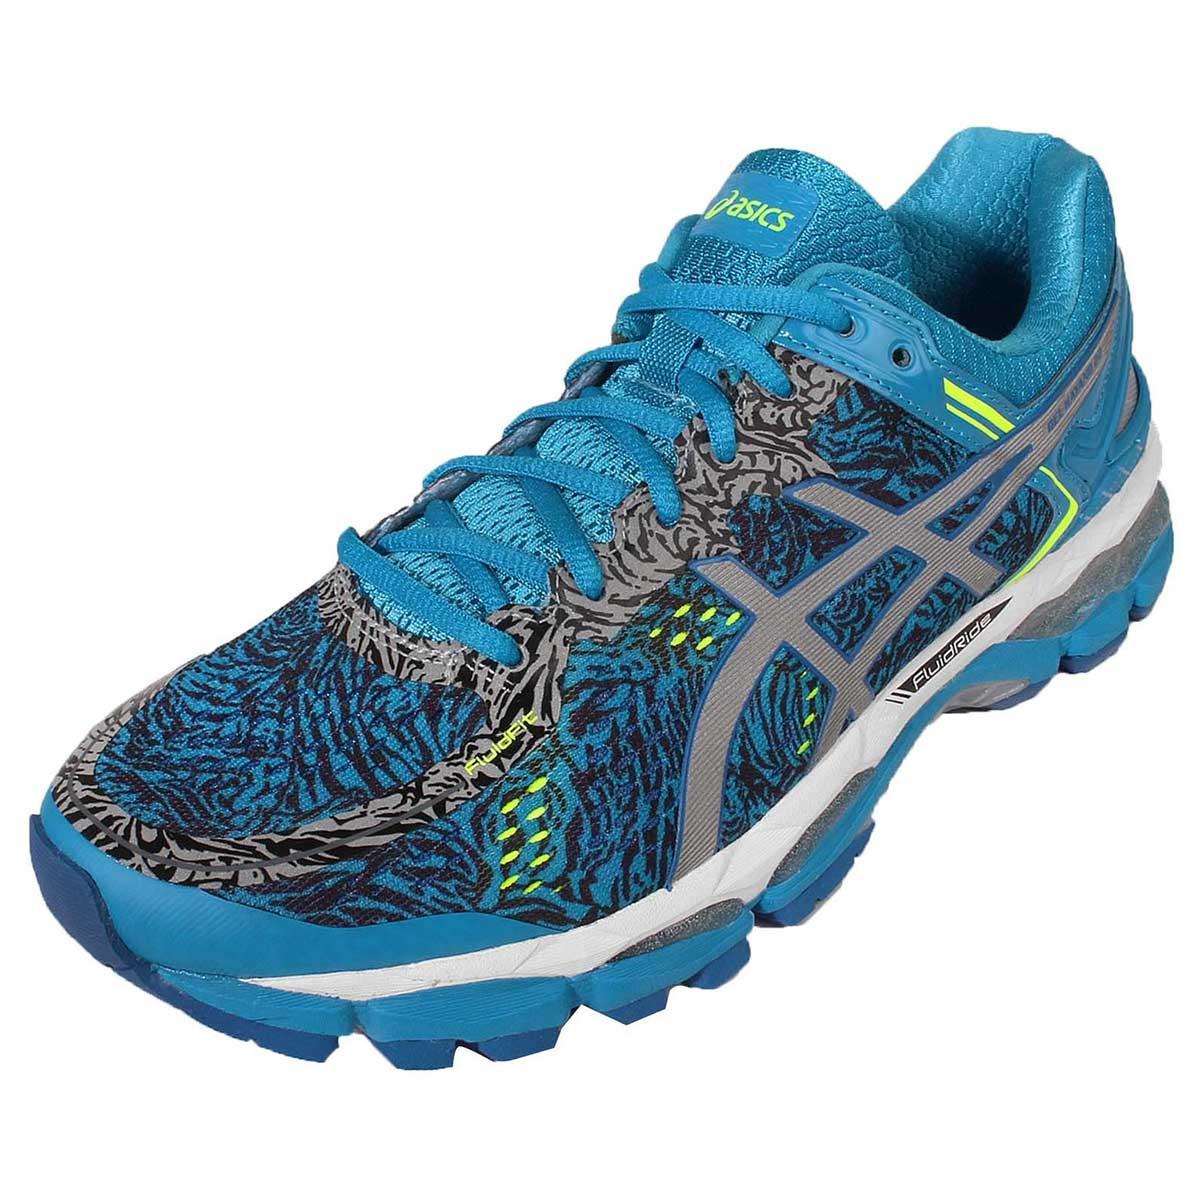 c45cb184e26c Buy Asics Gel-Kayano 22 Lite Show Men Running Shoes Online India